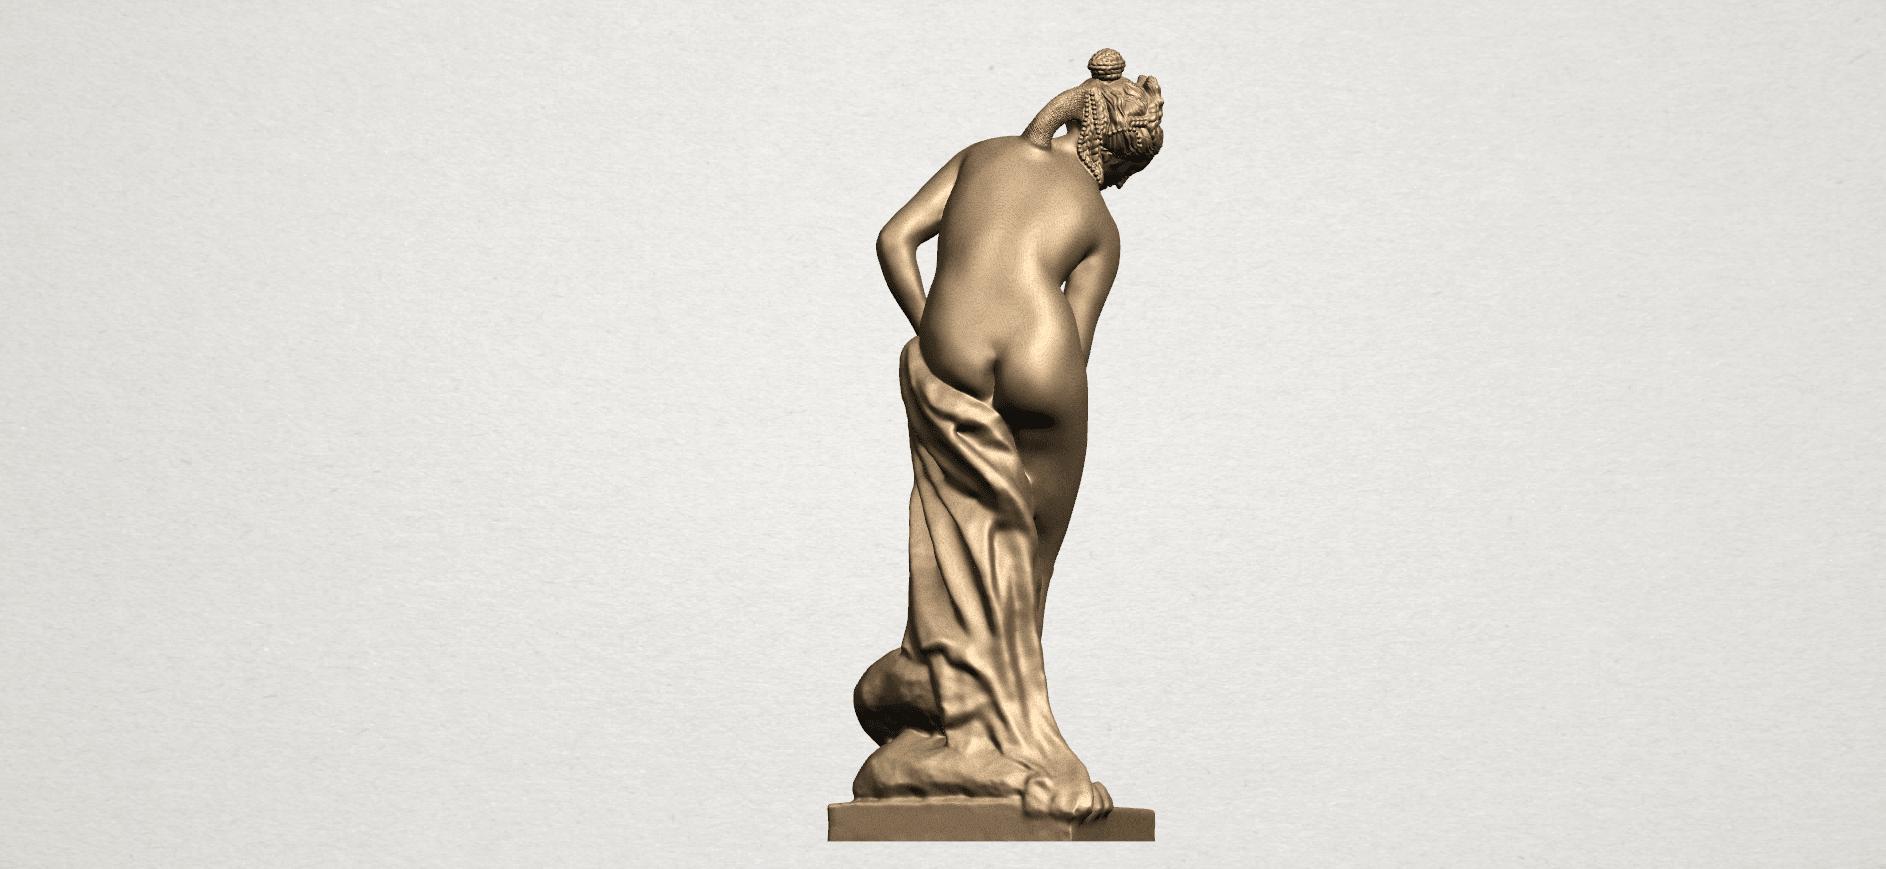 Naked Girl (iv) A05.png Download free STL file Naked Girl 04 • 3D print design, GeorgesNikkei